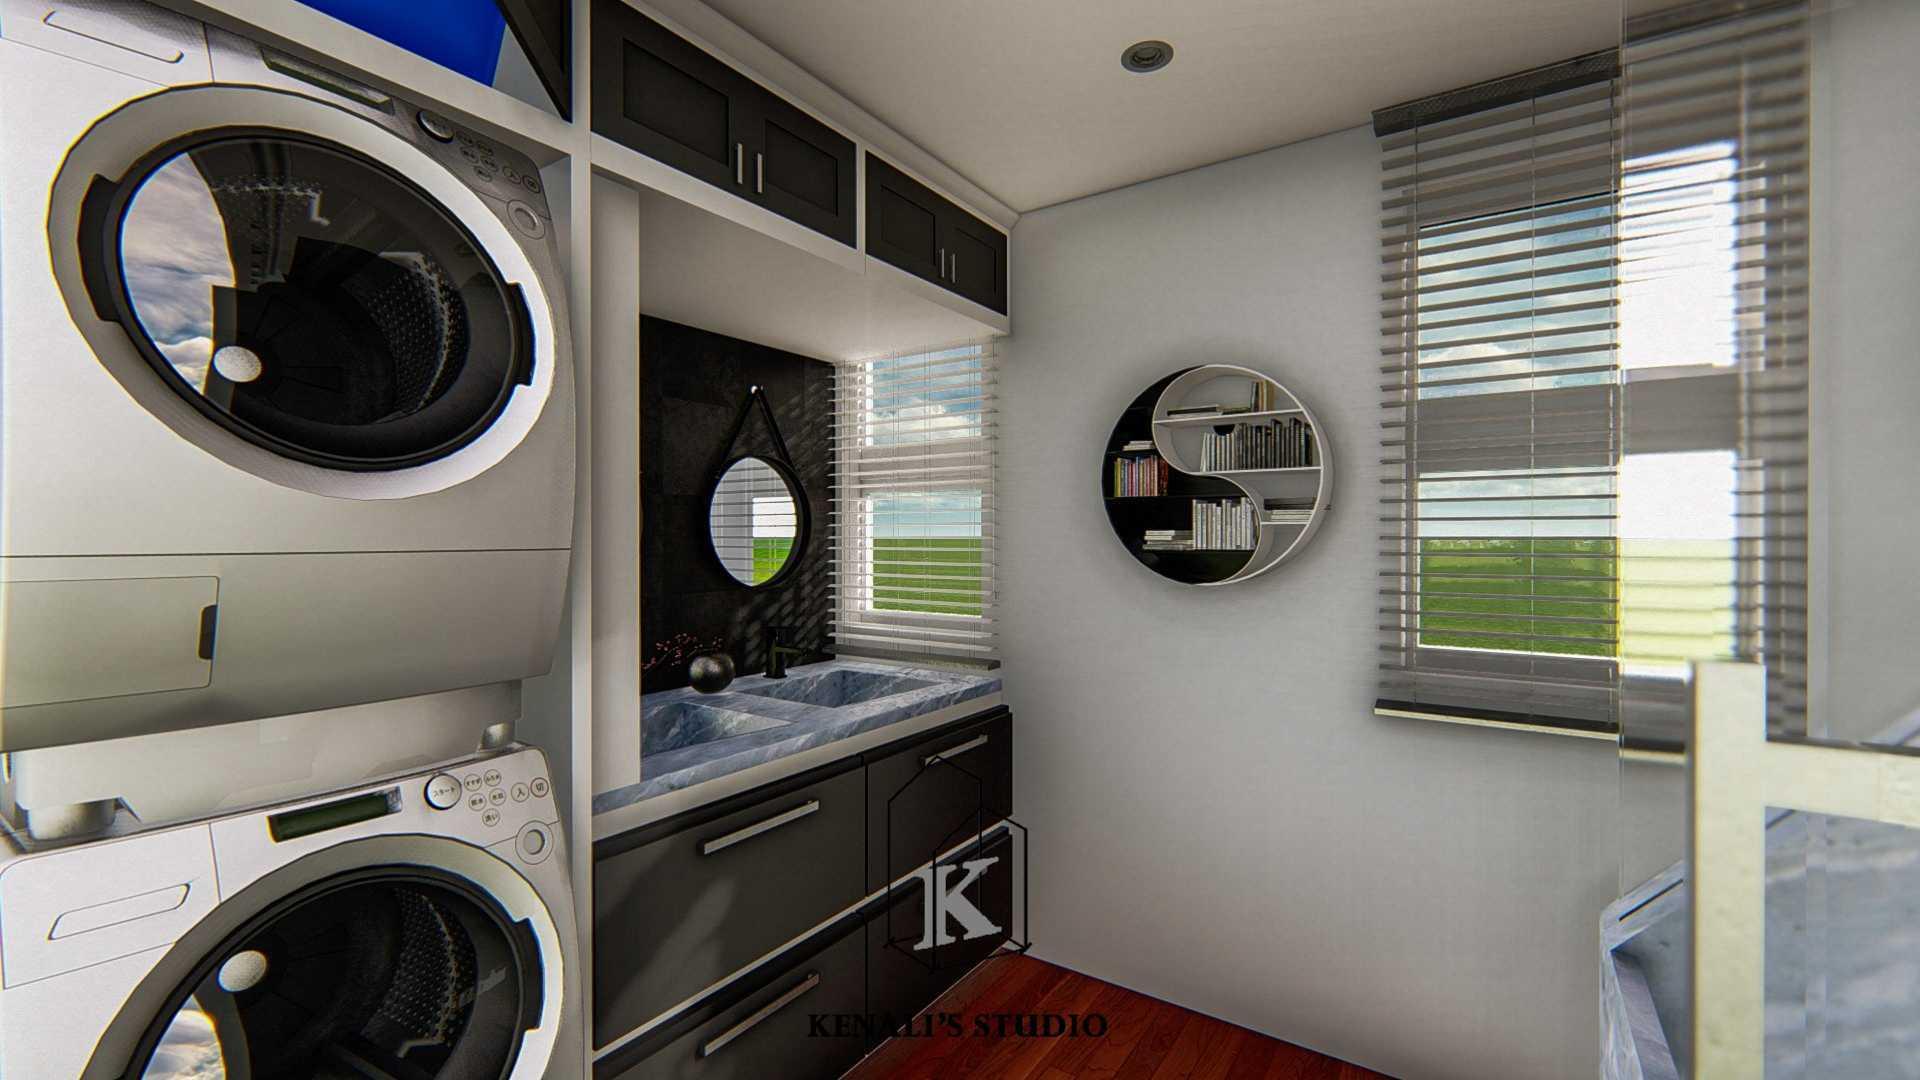 Kenali's Studio Project : Laundry & Bathroom Amerika Serikat Amerika Serikat Kenalis-Studio-Project-Laundry-Bathroom  72921